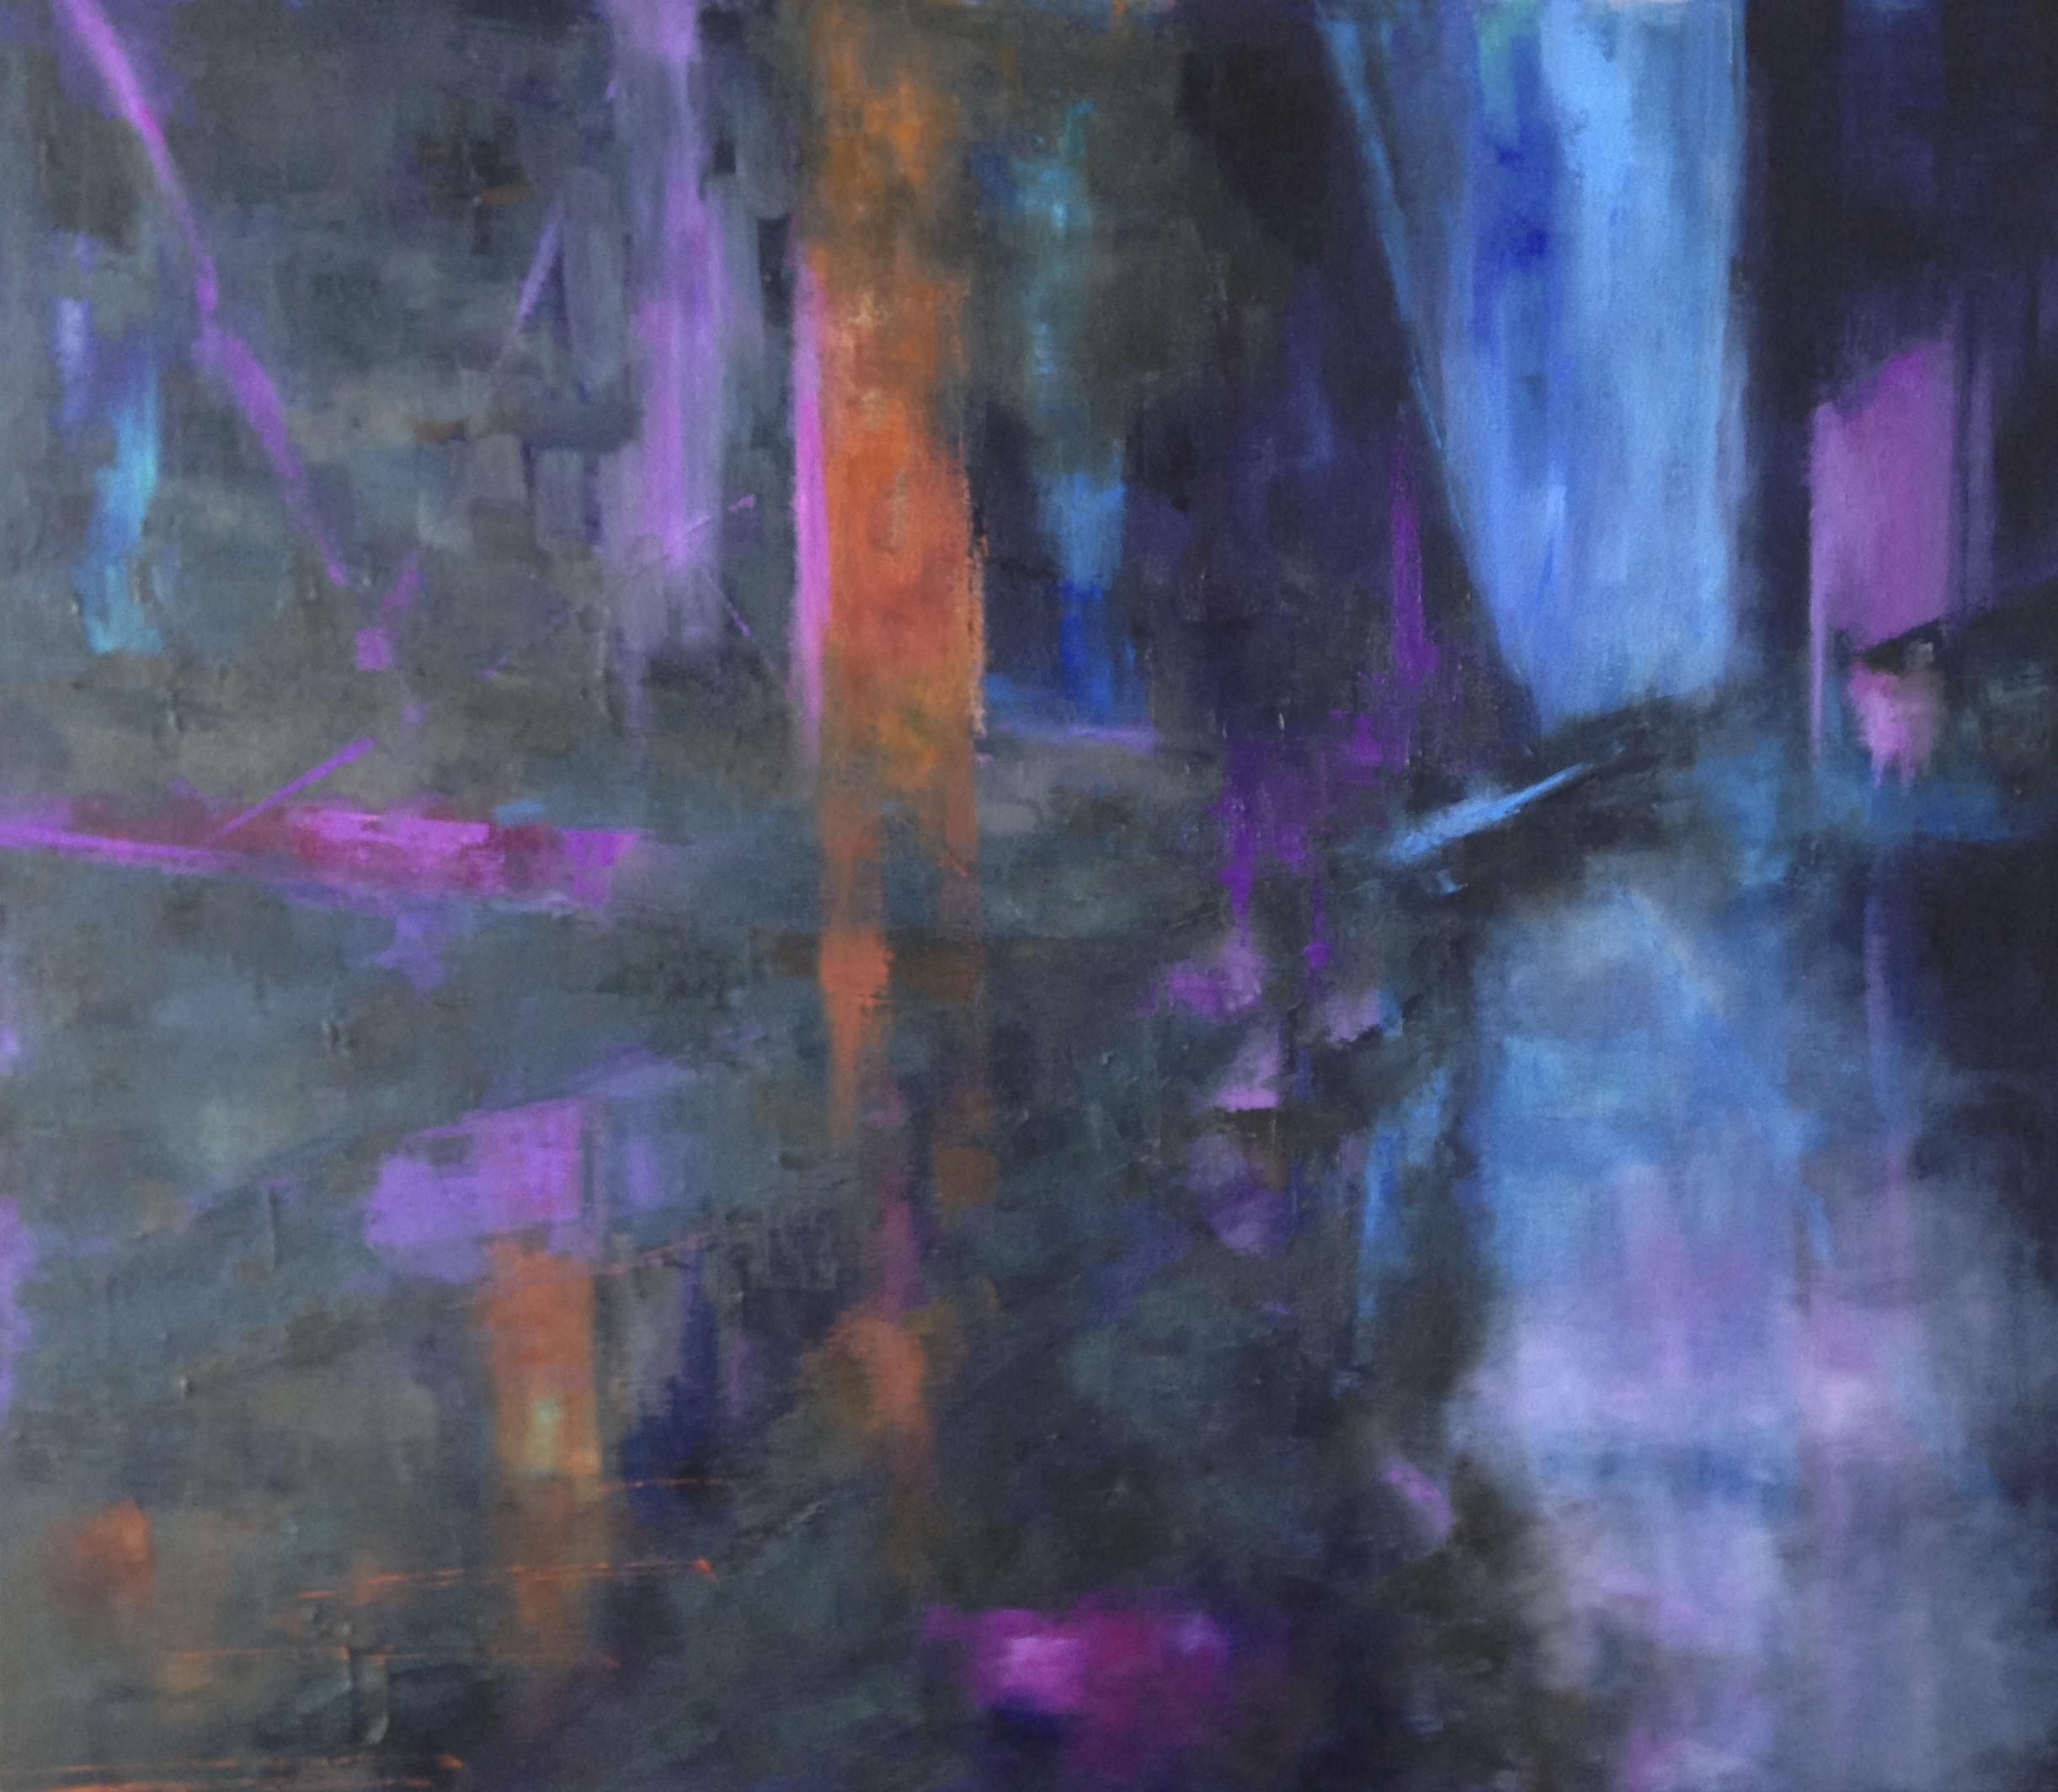 Tokyo Nights, Oil on Canvas, 36x30